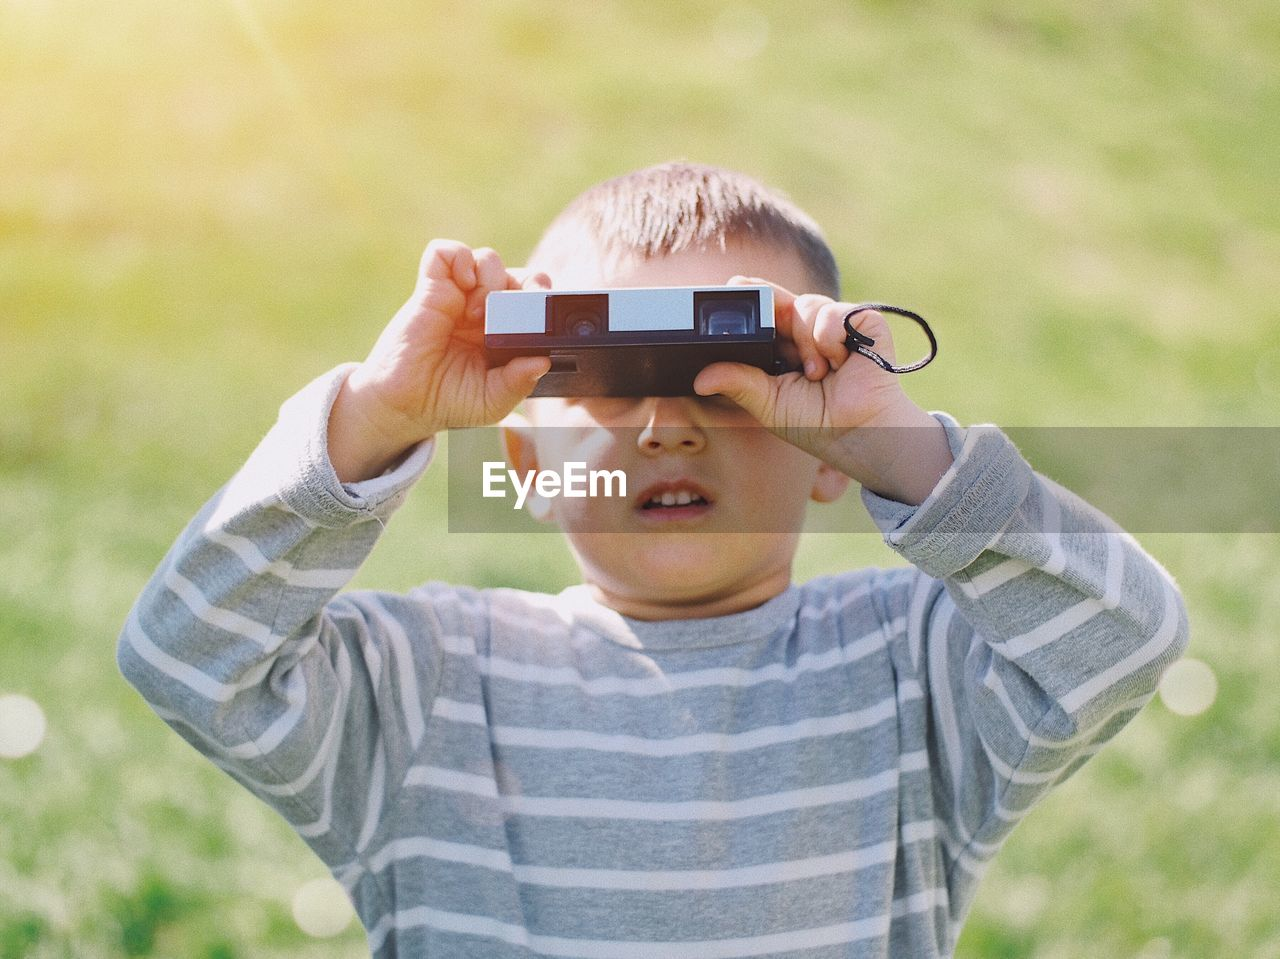 Boy looking through binoculars on grass